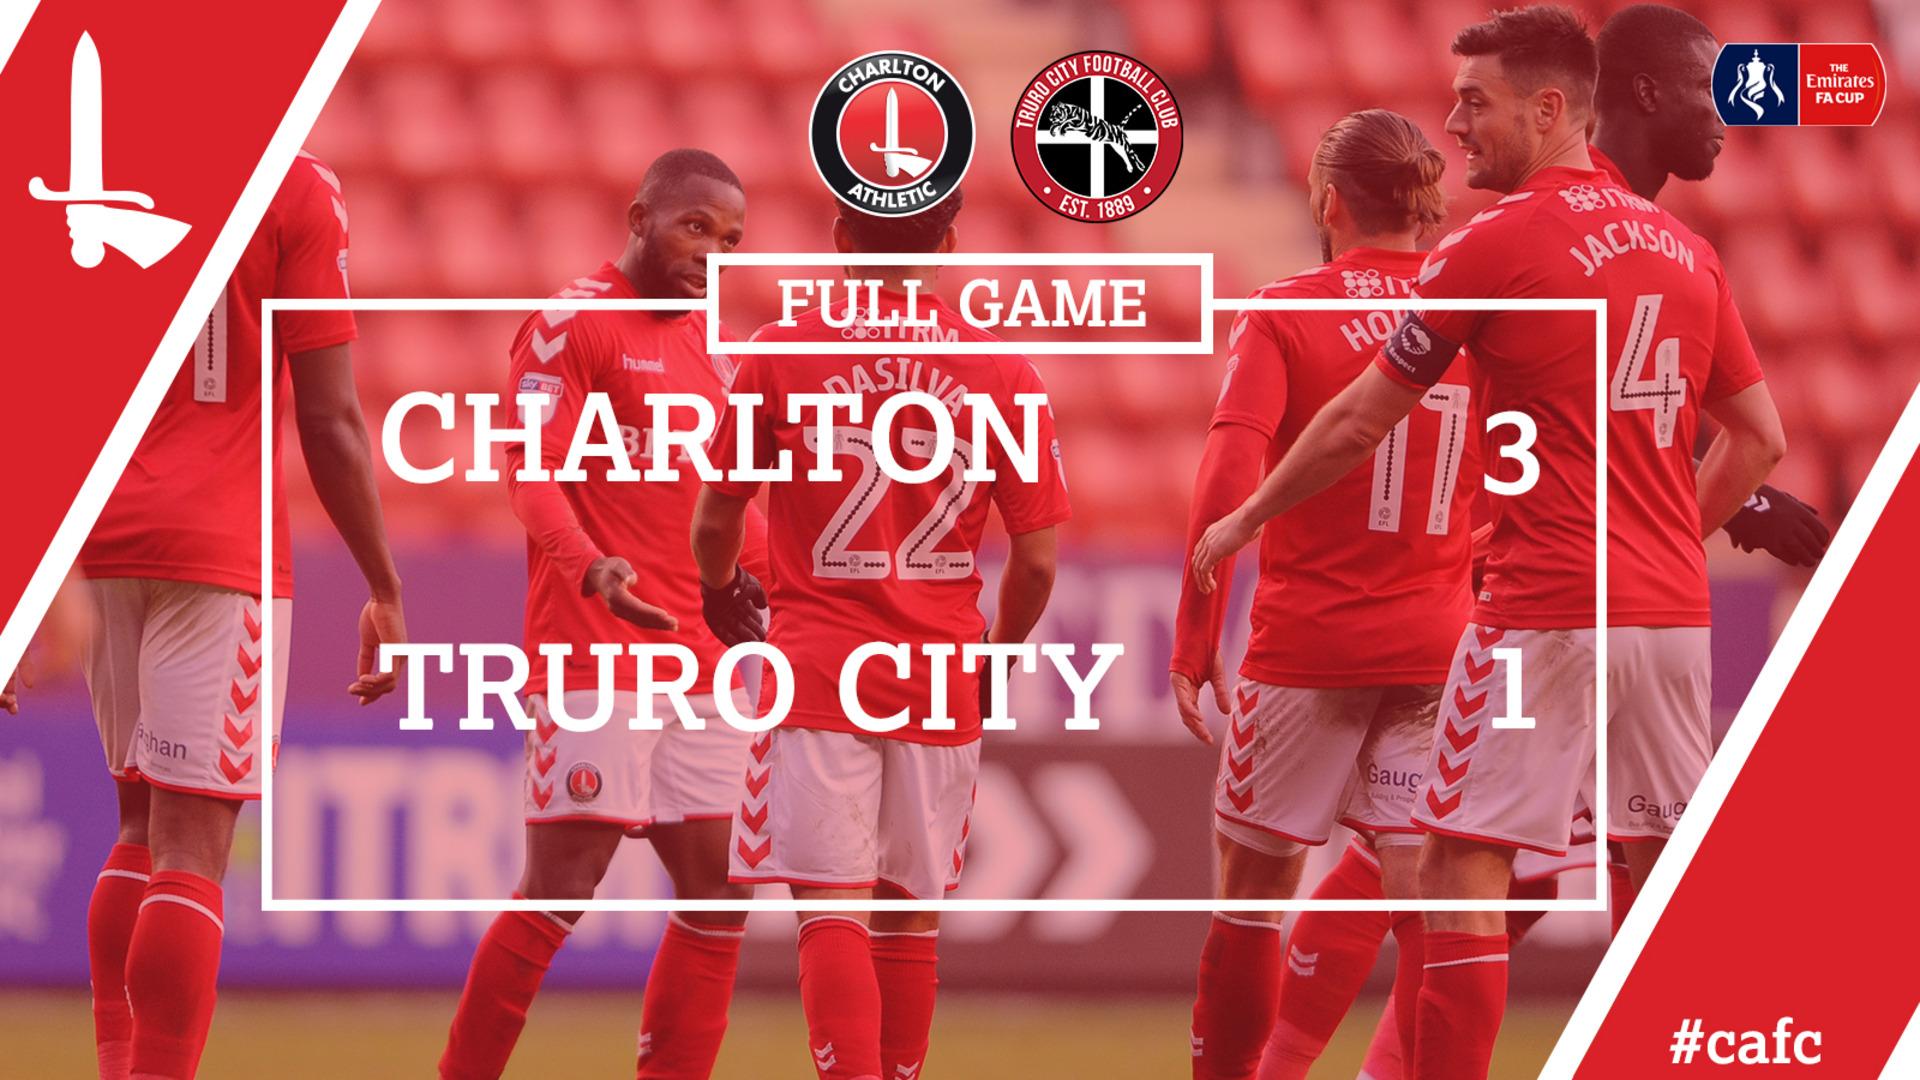 FULL GAME | Charlton 3 Truro City 1